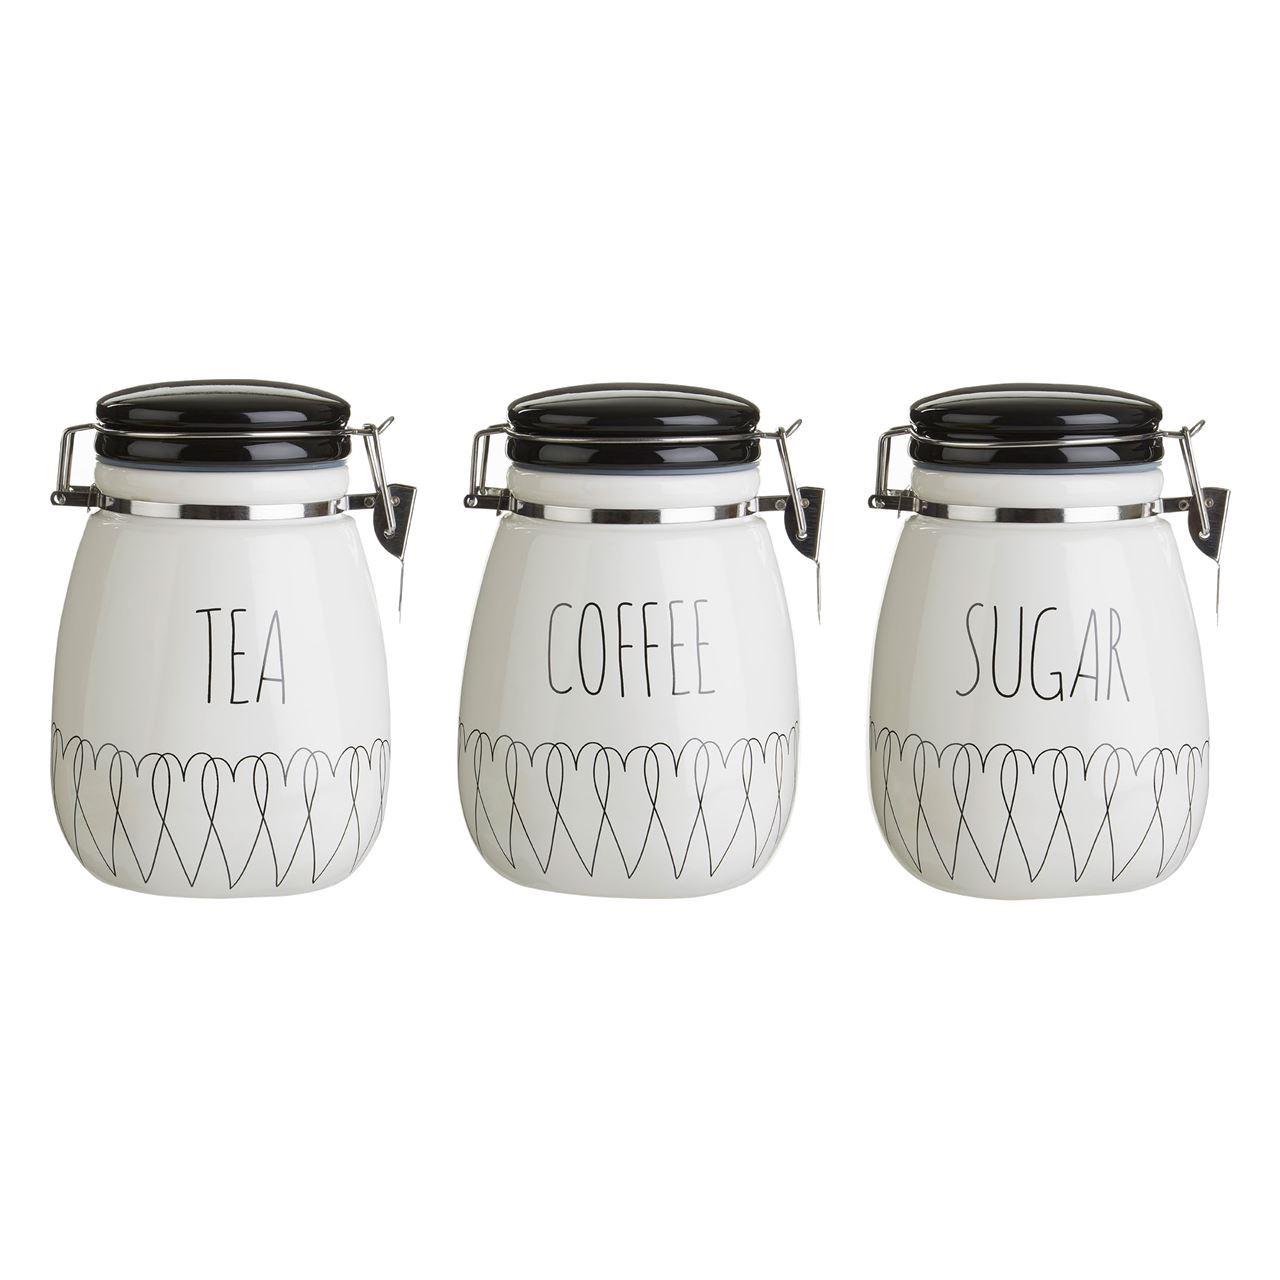 tea coffee sugar canisters heartlines tea coffee sugar canisters kitchen storage jars